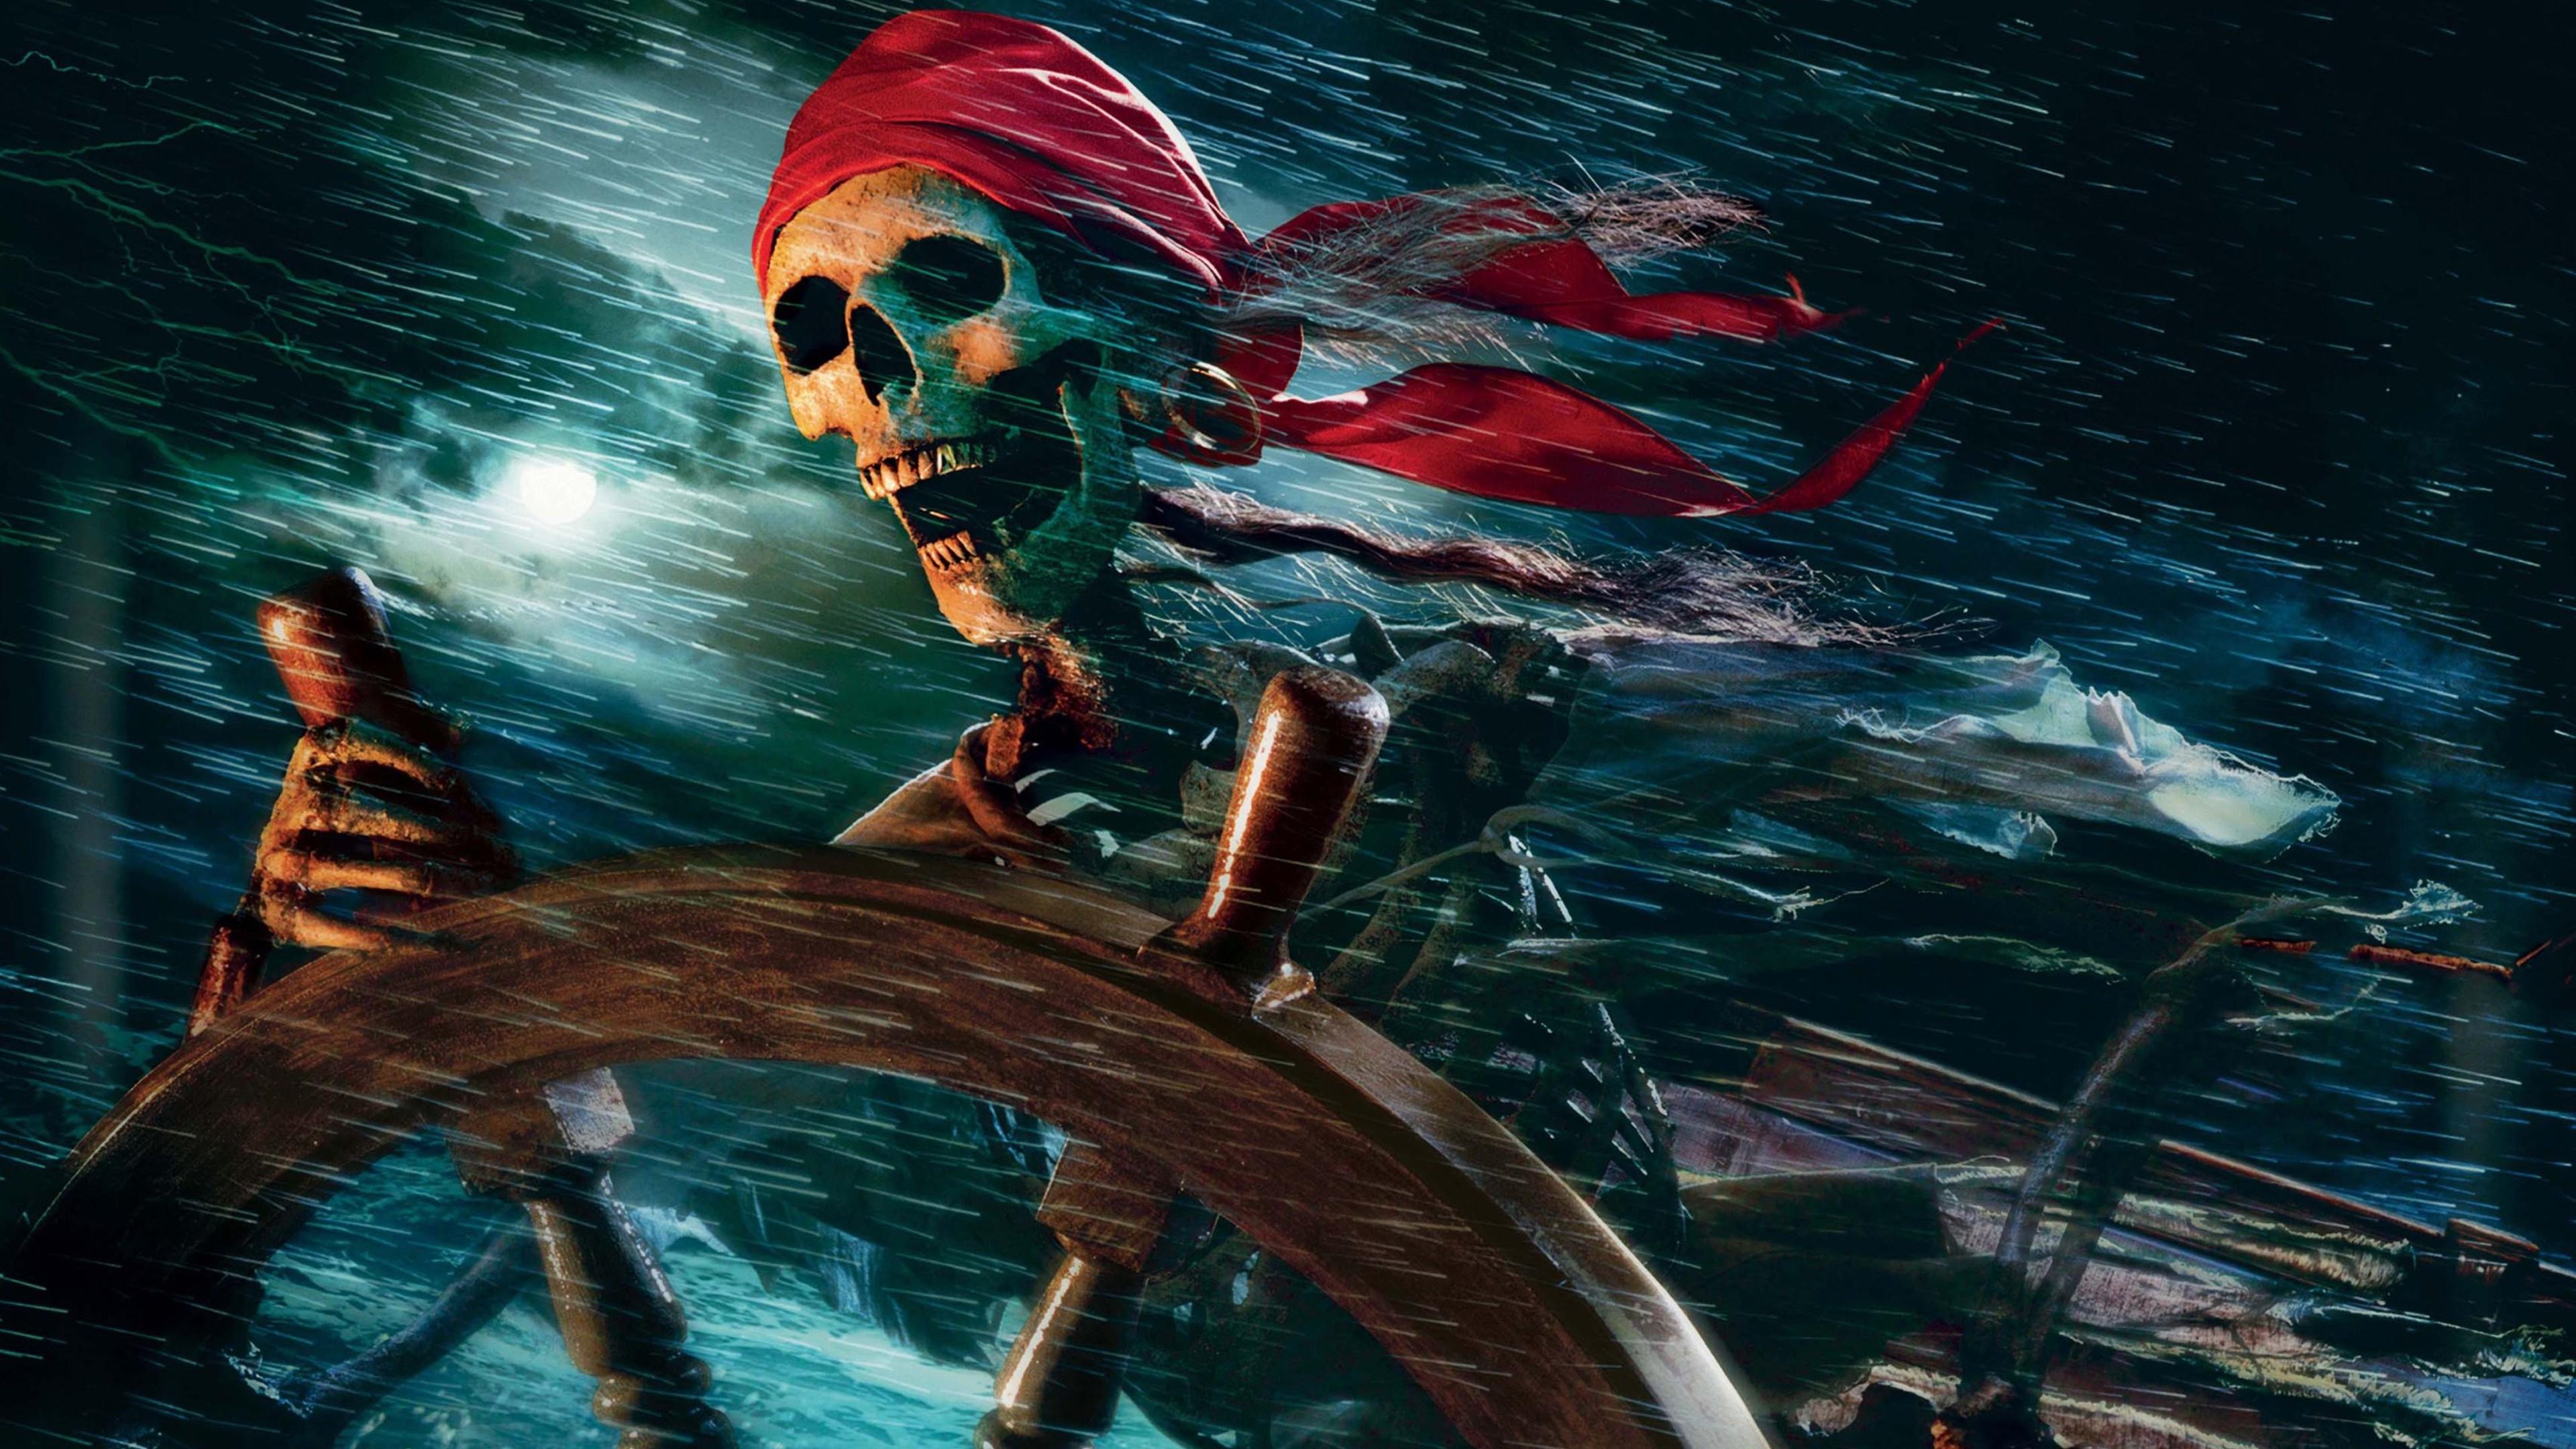 2048x1152 pirate cartoons 2048x1152 resolution hd 4k - Anime pirate wallpaper ...